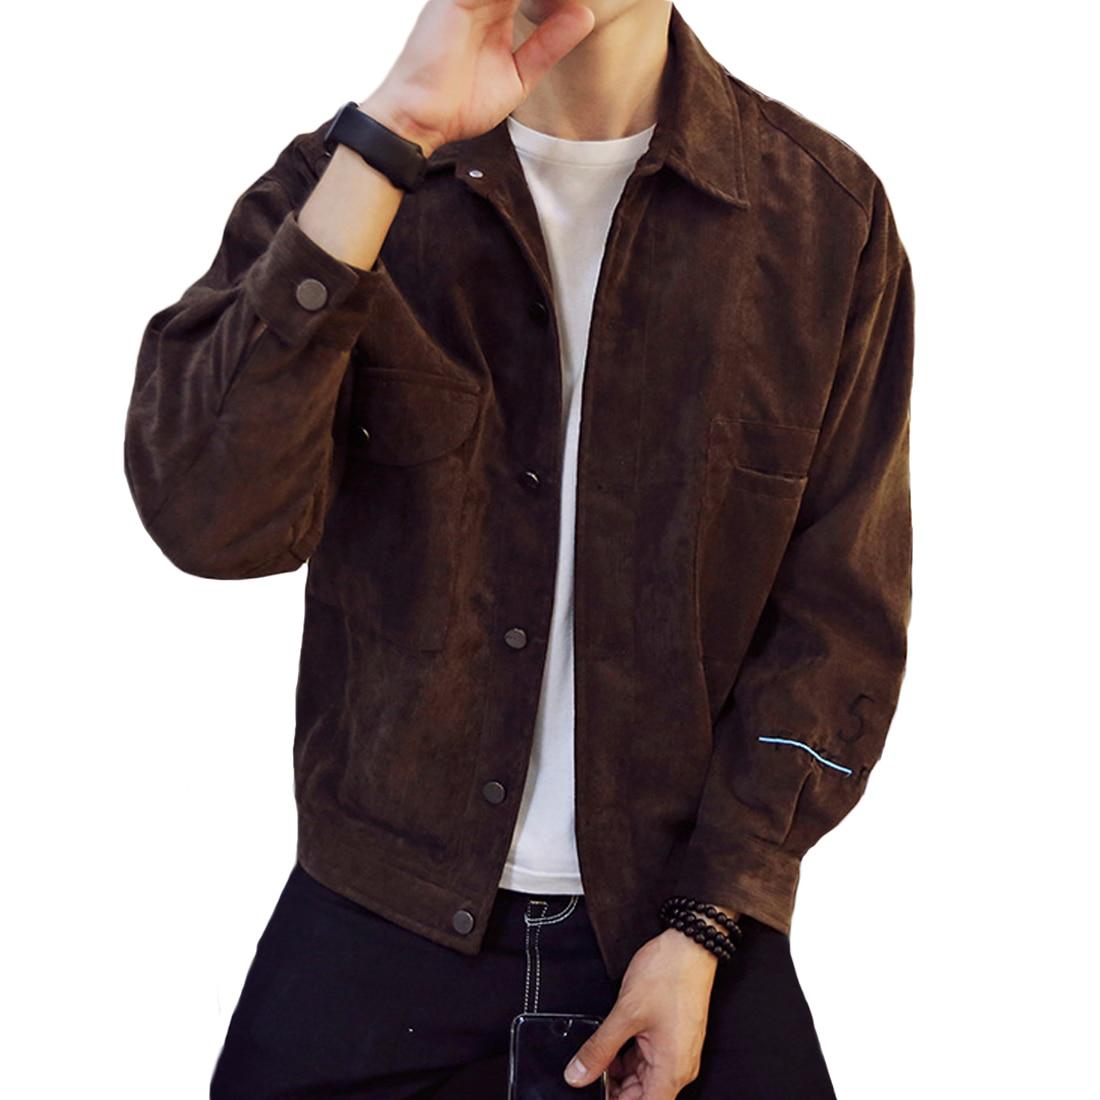 Mens jacket online - 2017 Spring Autumn Hot Corduroy Jackets Men Long Sleeve Turn Down Collar Slim Solid Bomber Jacket